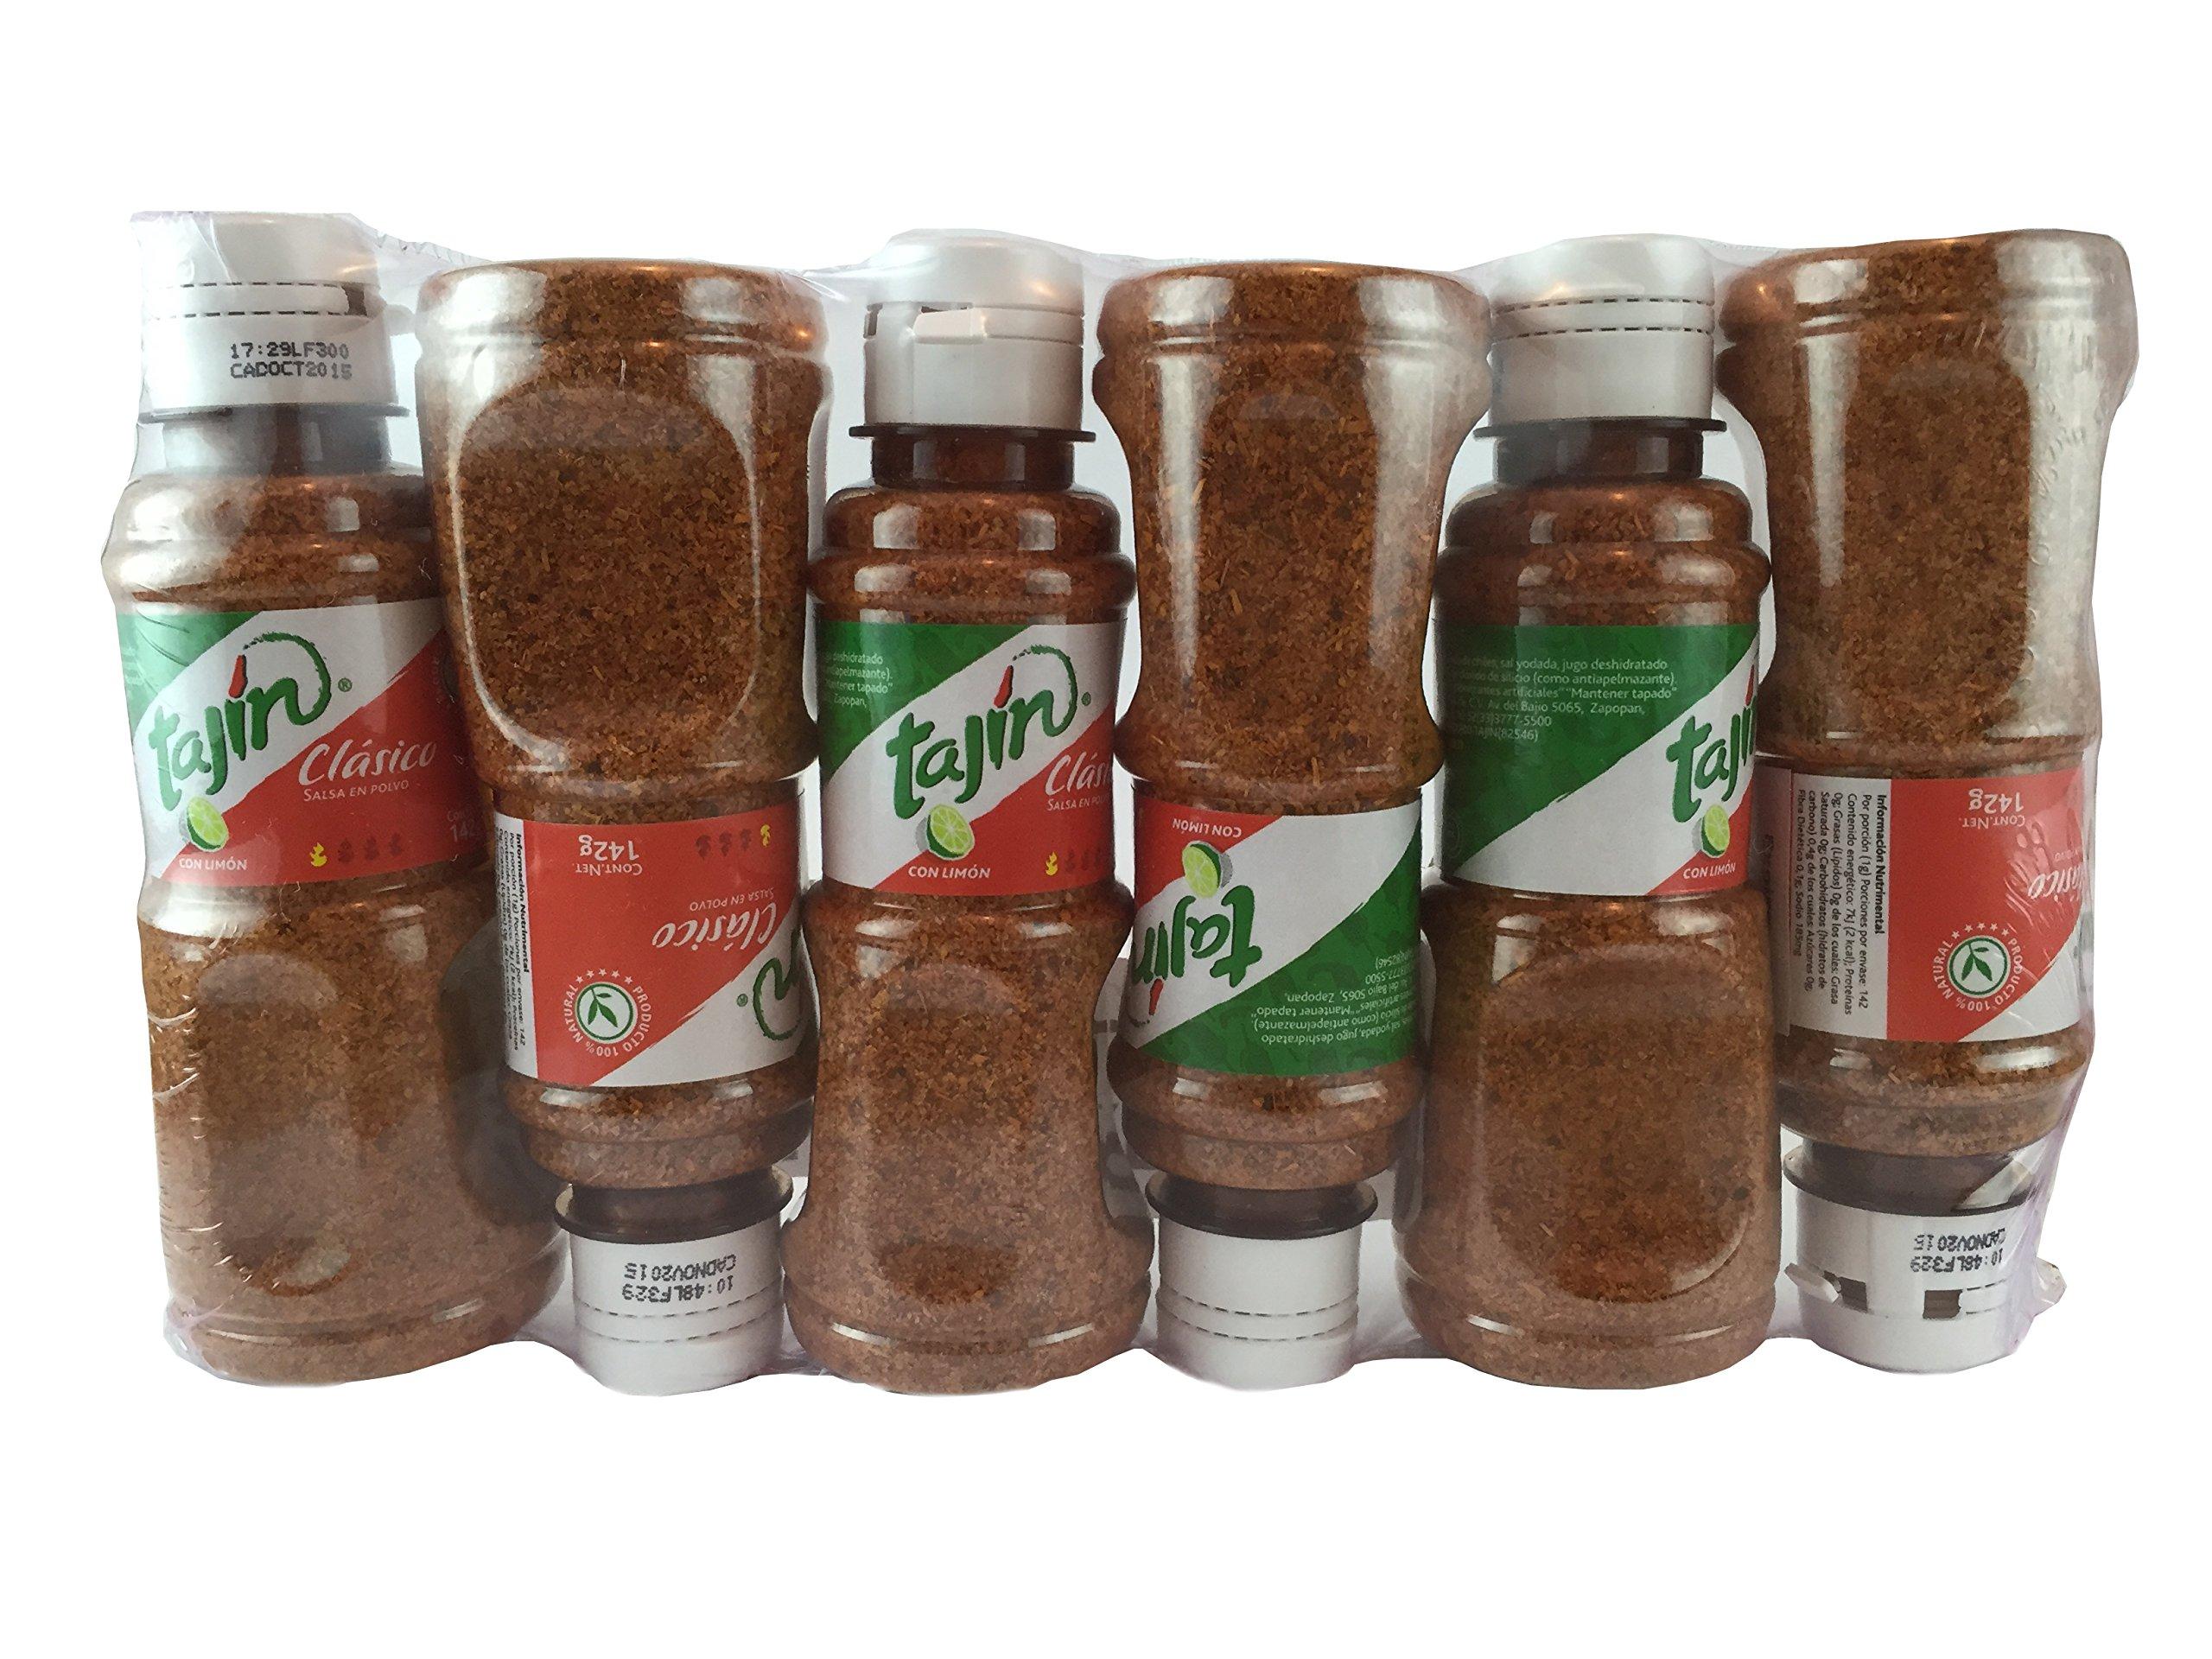 Tajin Clasico Fruit Seasoning with Lime, 5oz Bottle (Pack of 6)